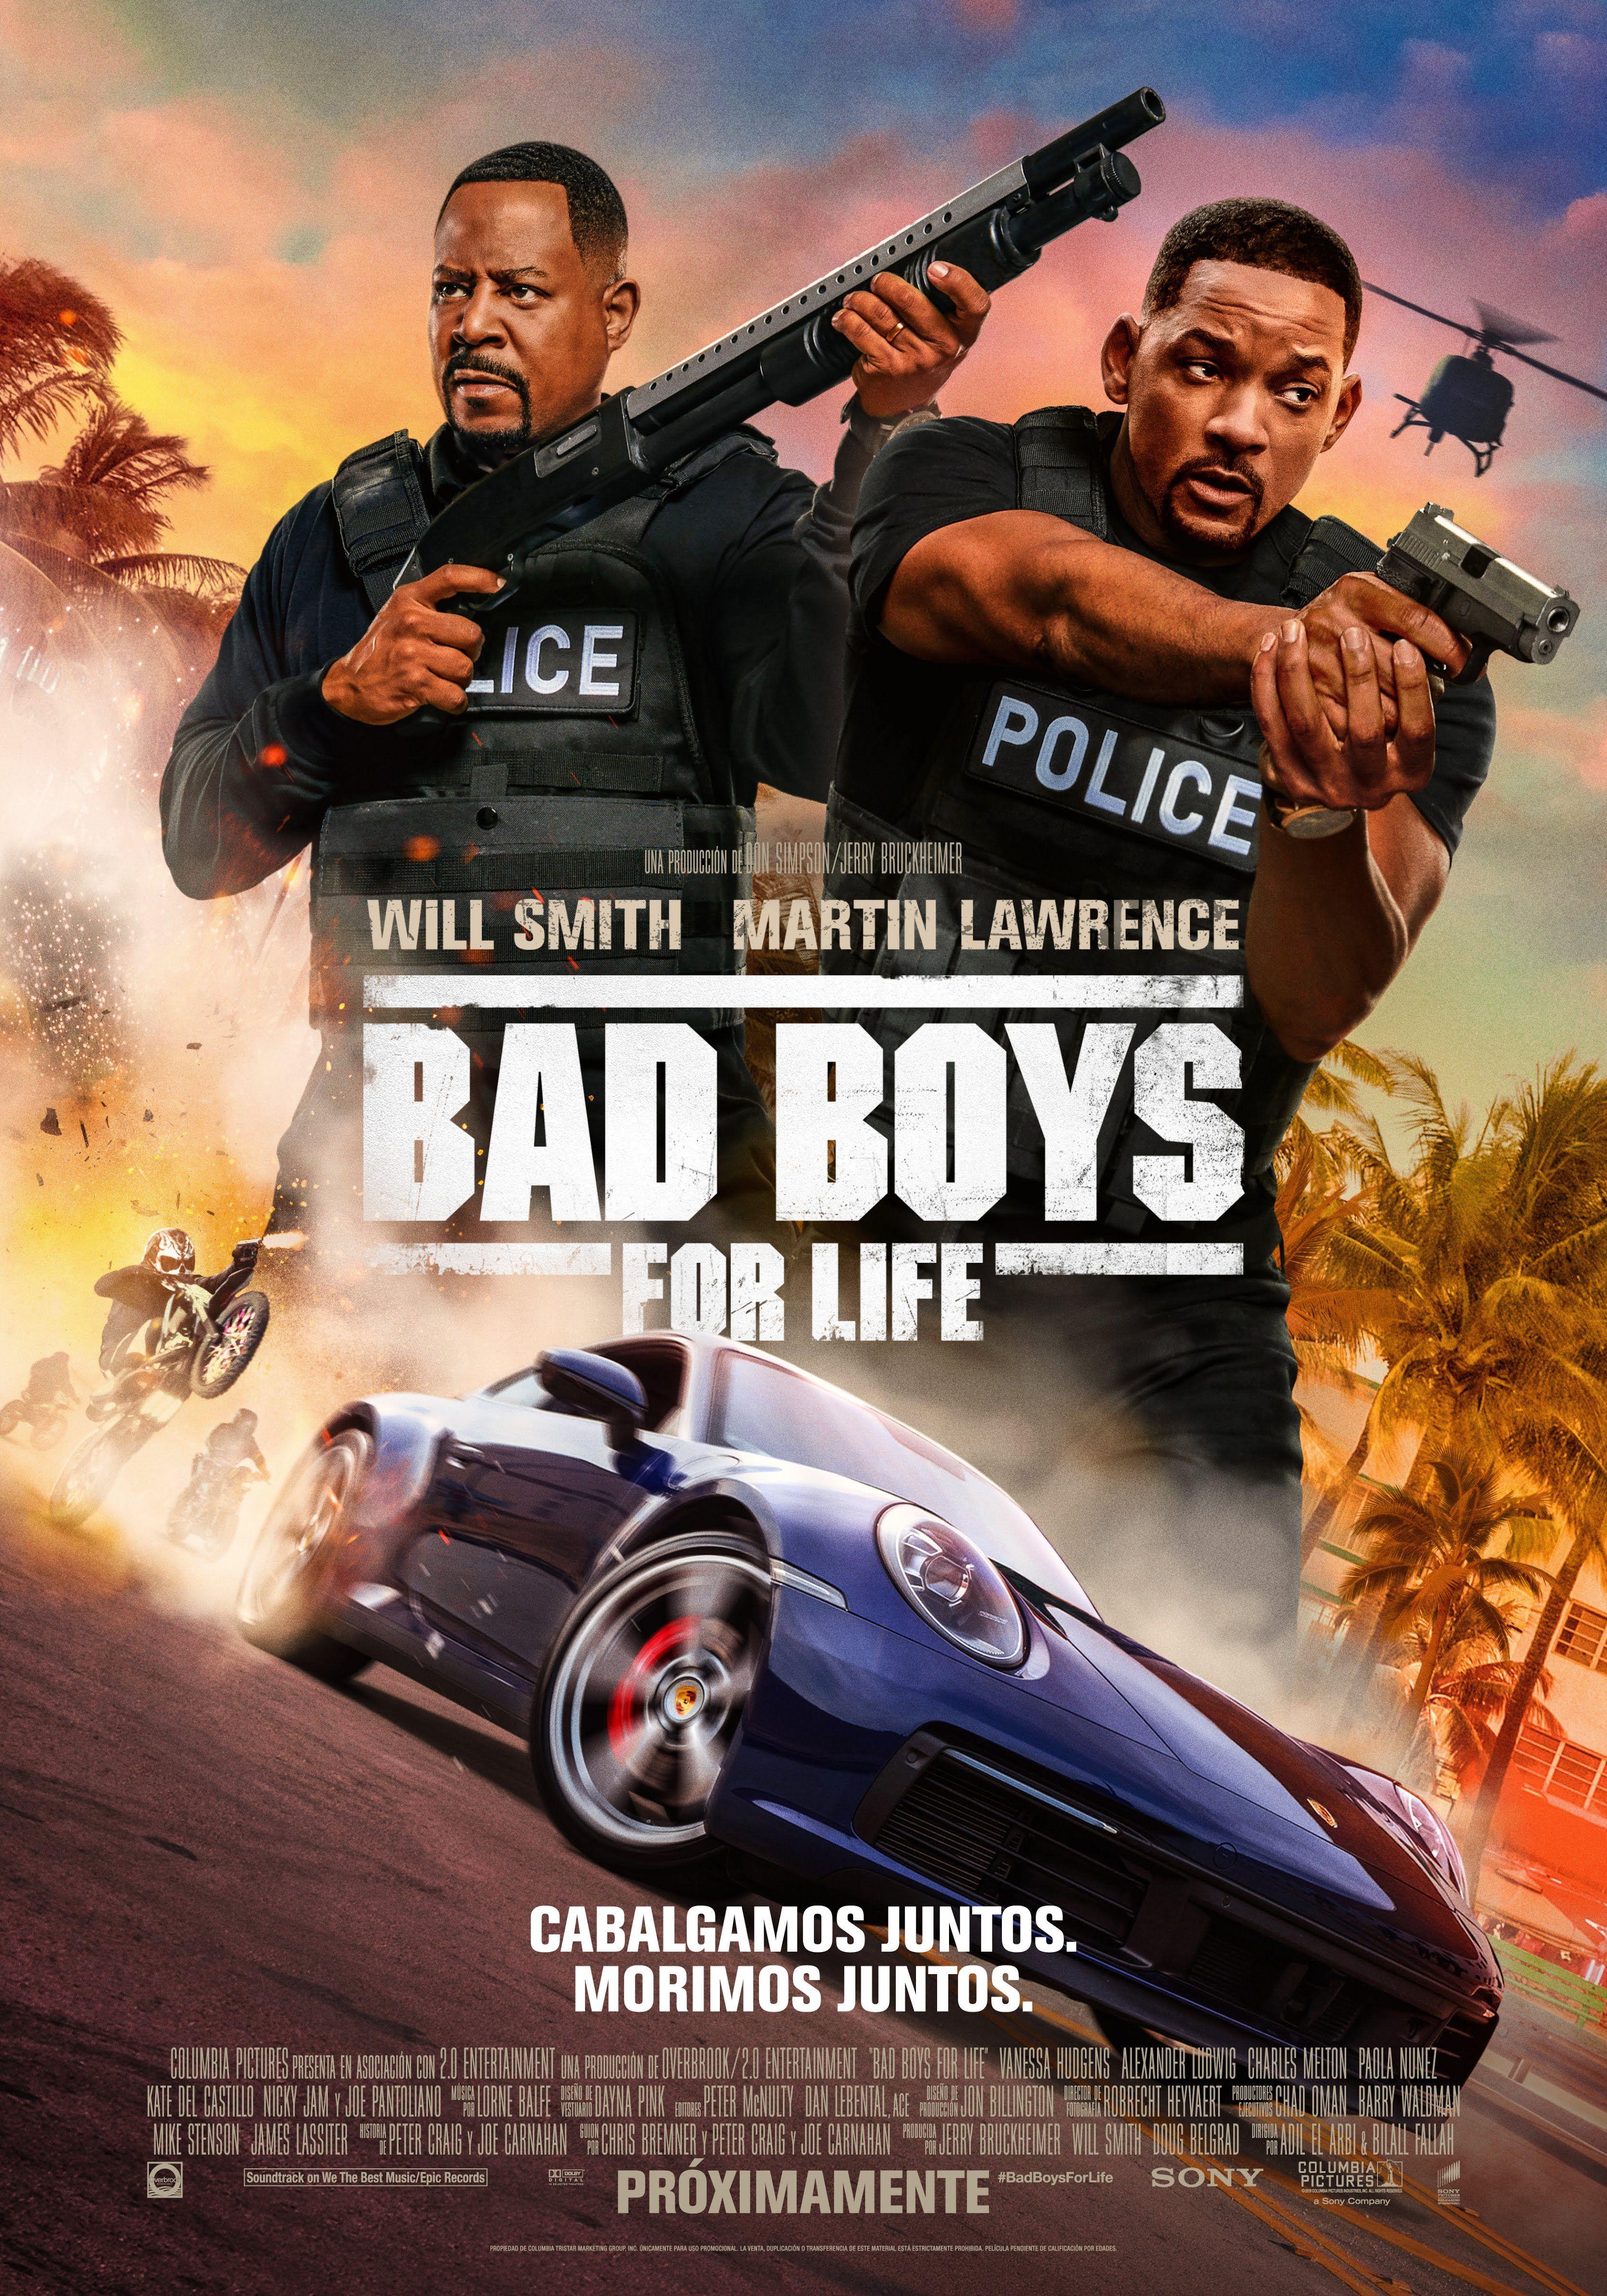 Bad Boys For Life Peliculas En Espanol Latino Peliculas En Espanol Peliculas Completas En Castellano